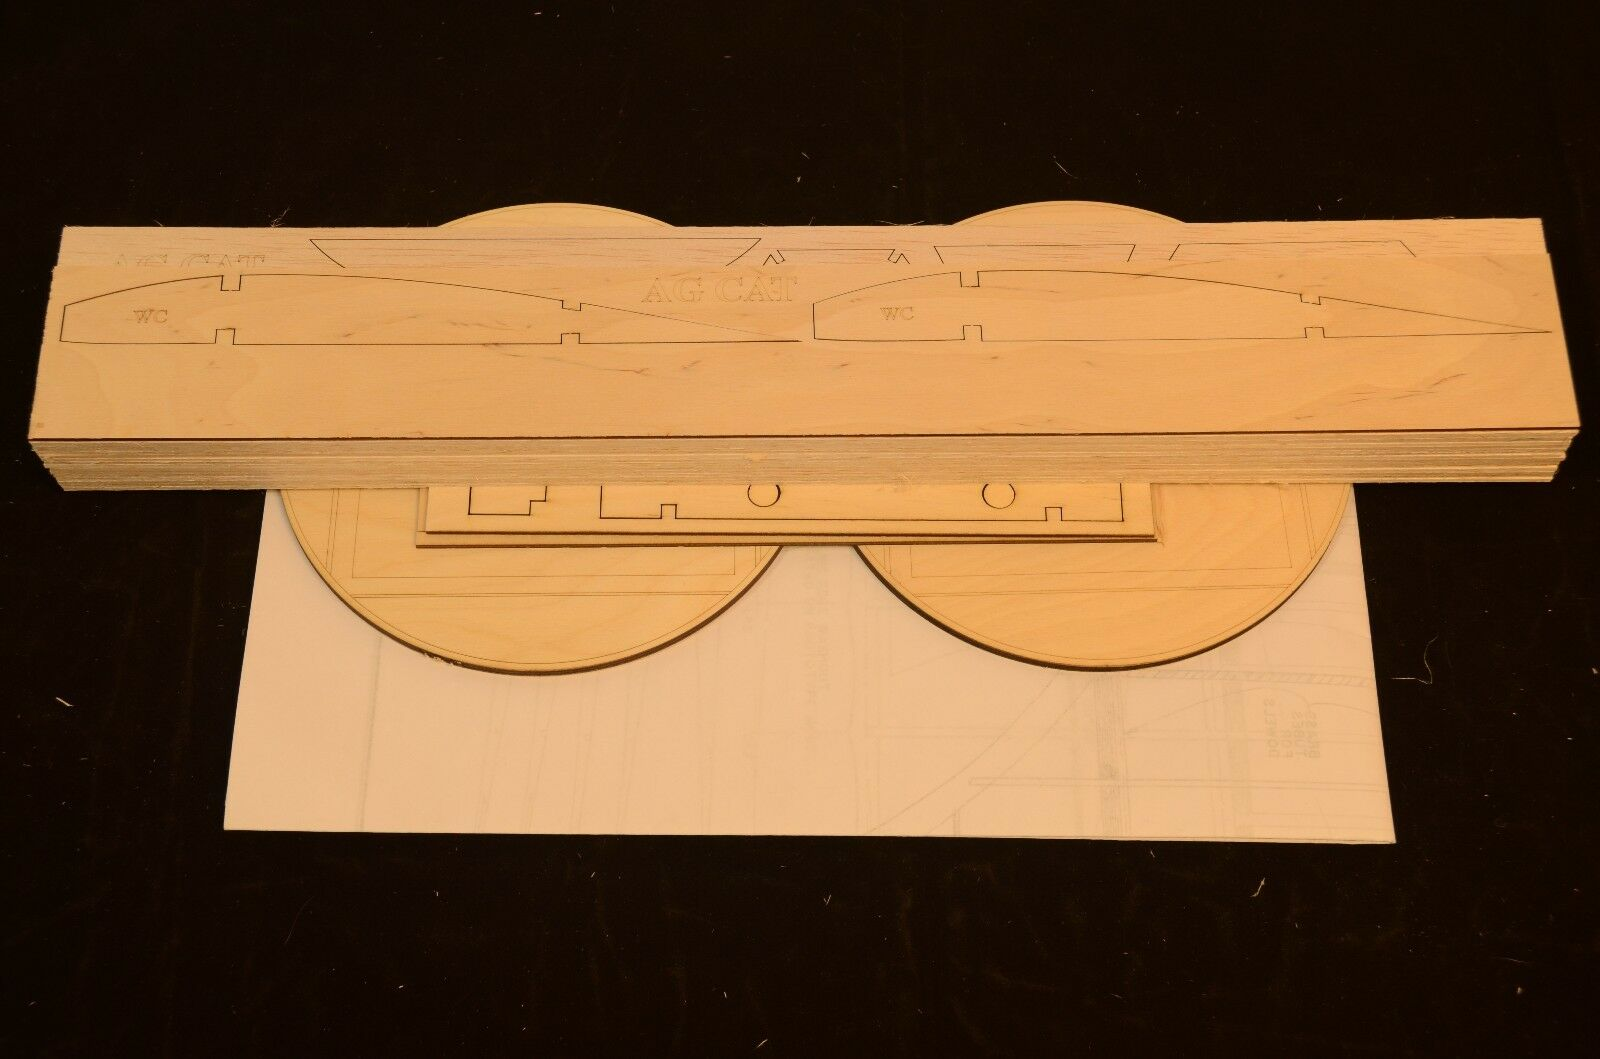 Giant 1 5.5 Scale Grumman AG CAT Laser Cut Short Kit, Plans & Instr 90 in. WS